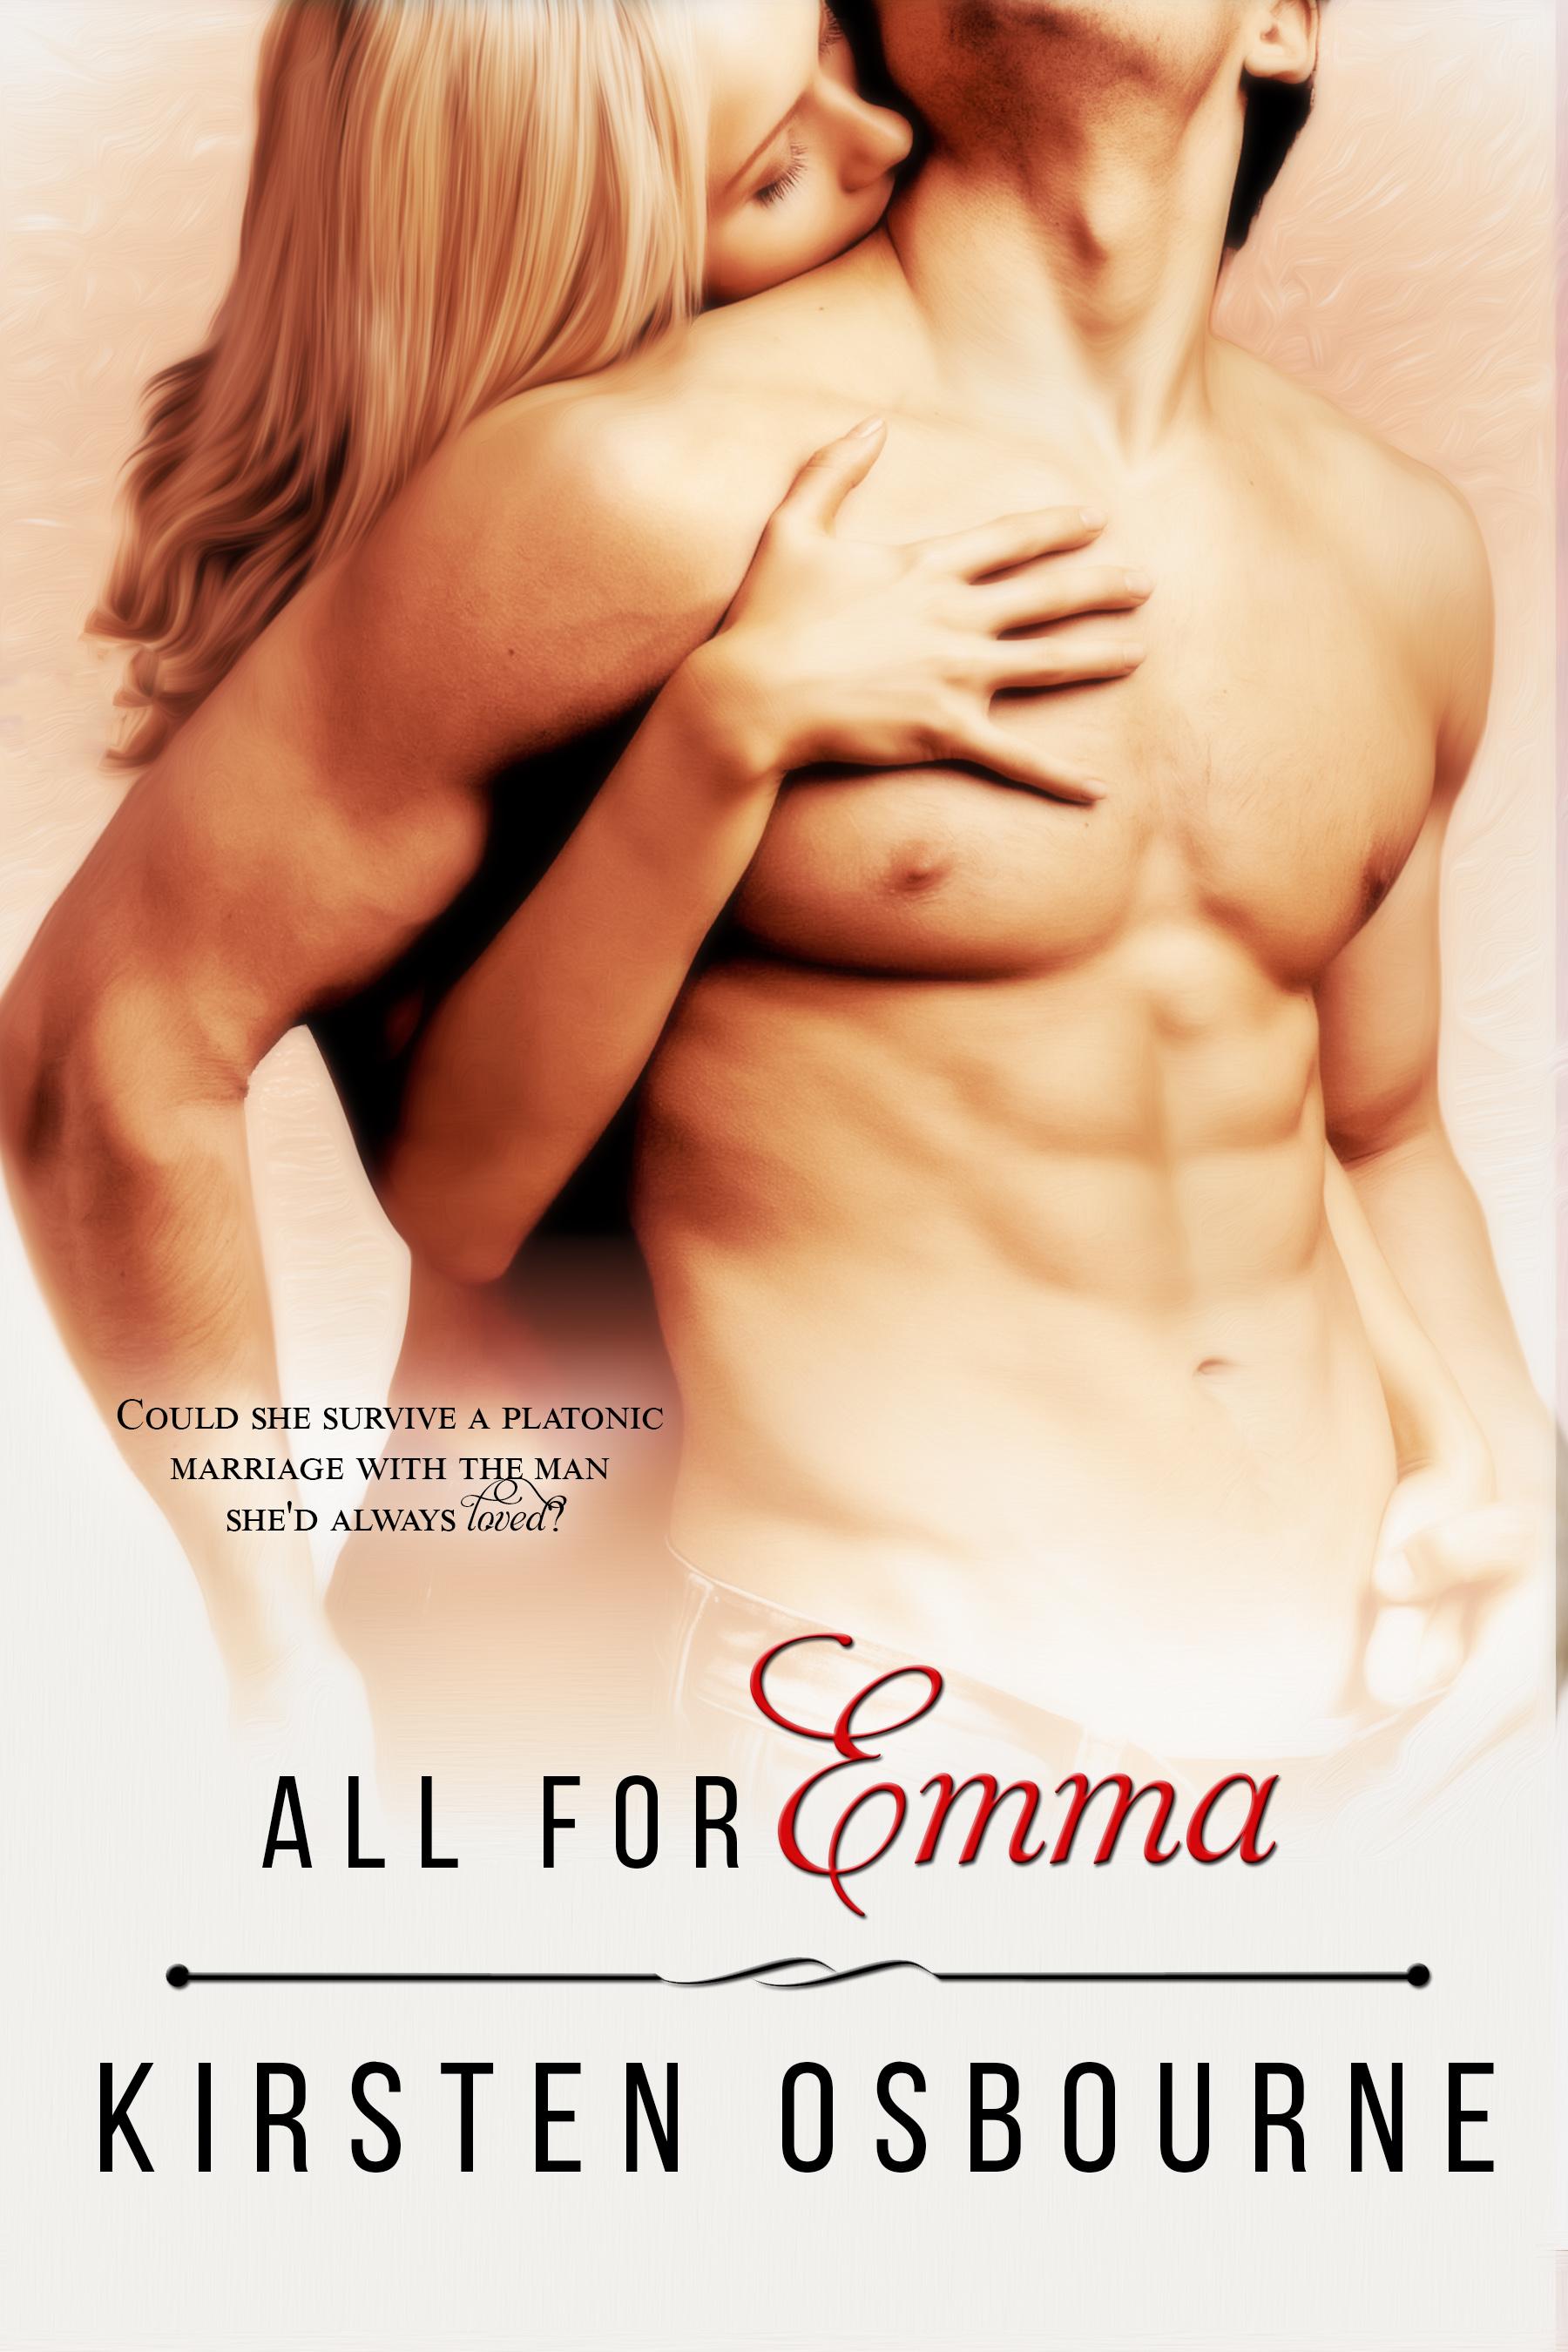 Kirsten Osbourne - All For Emma